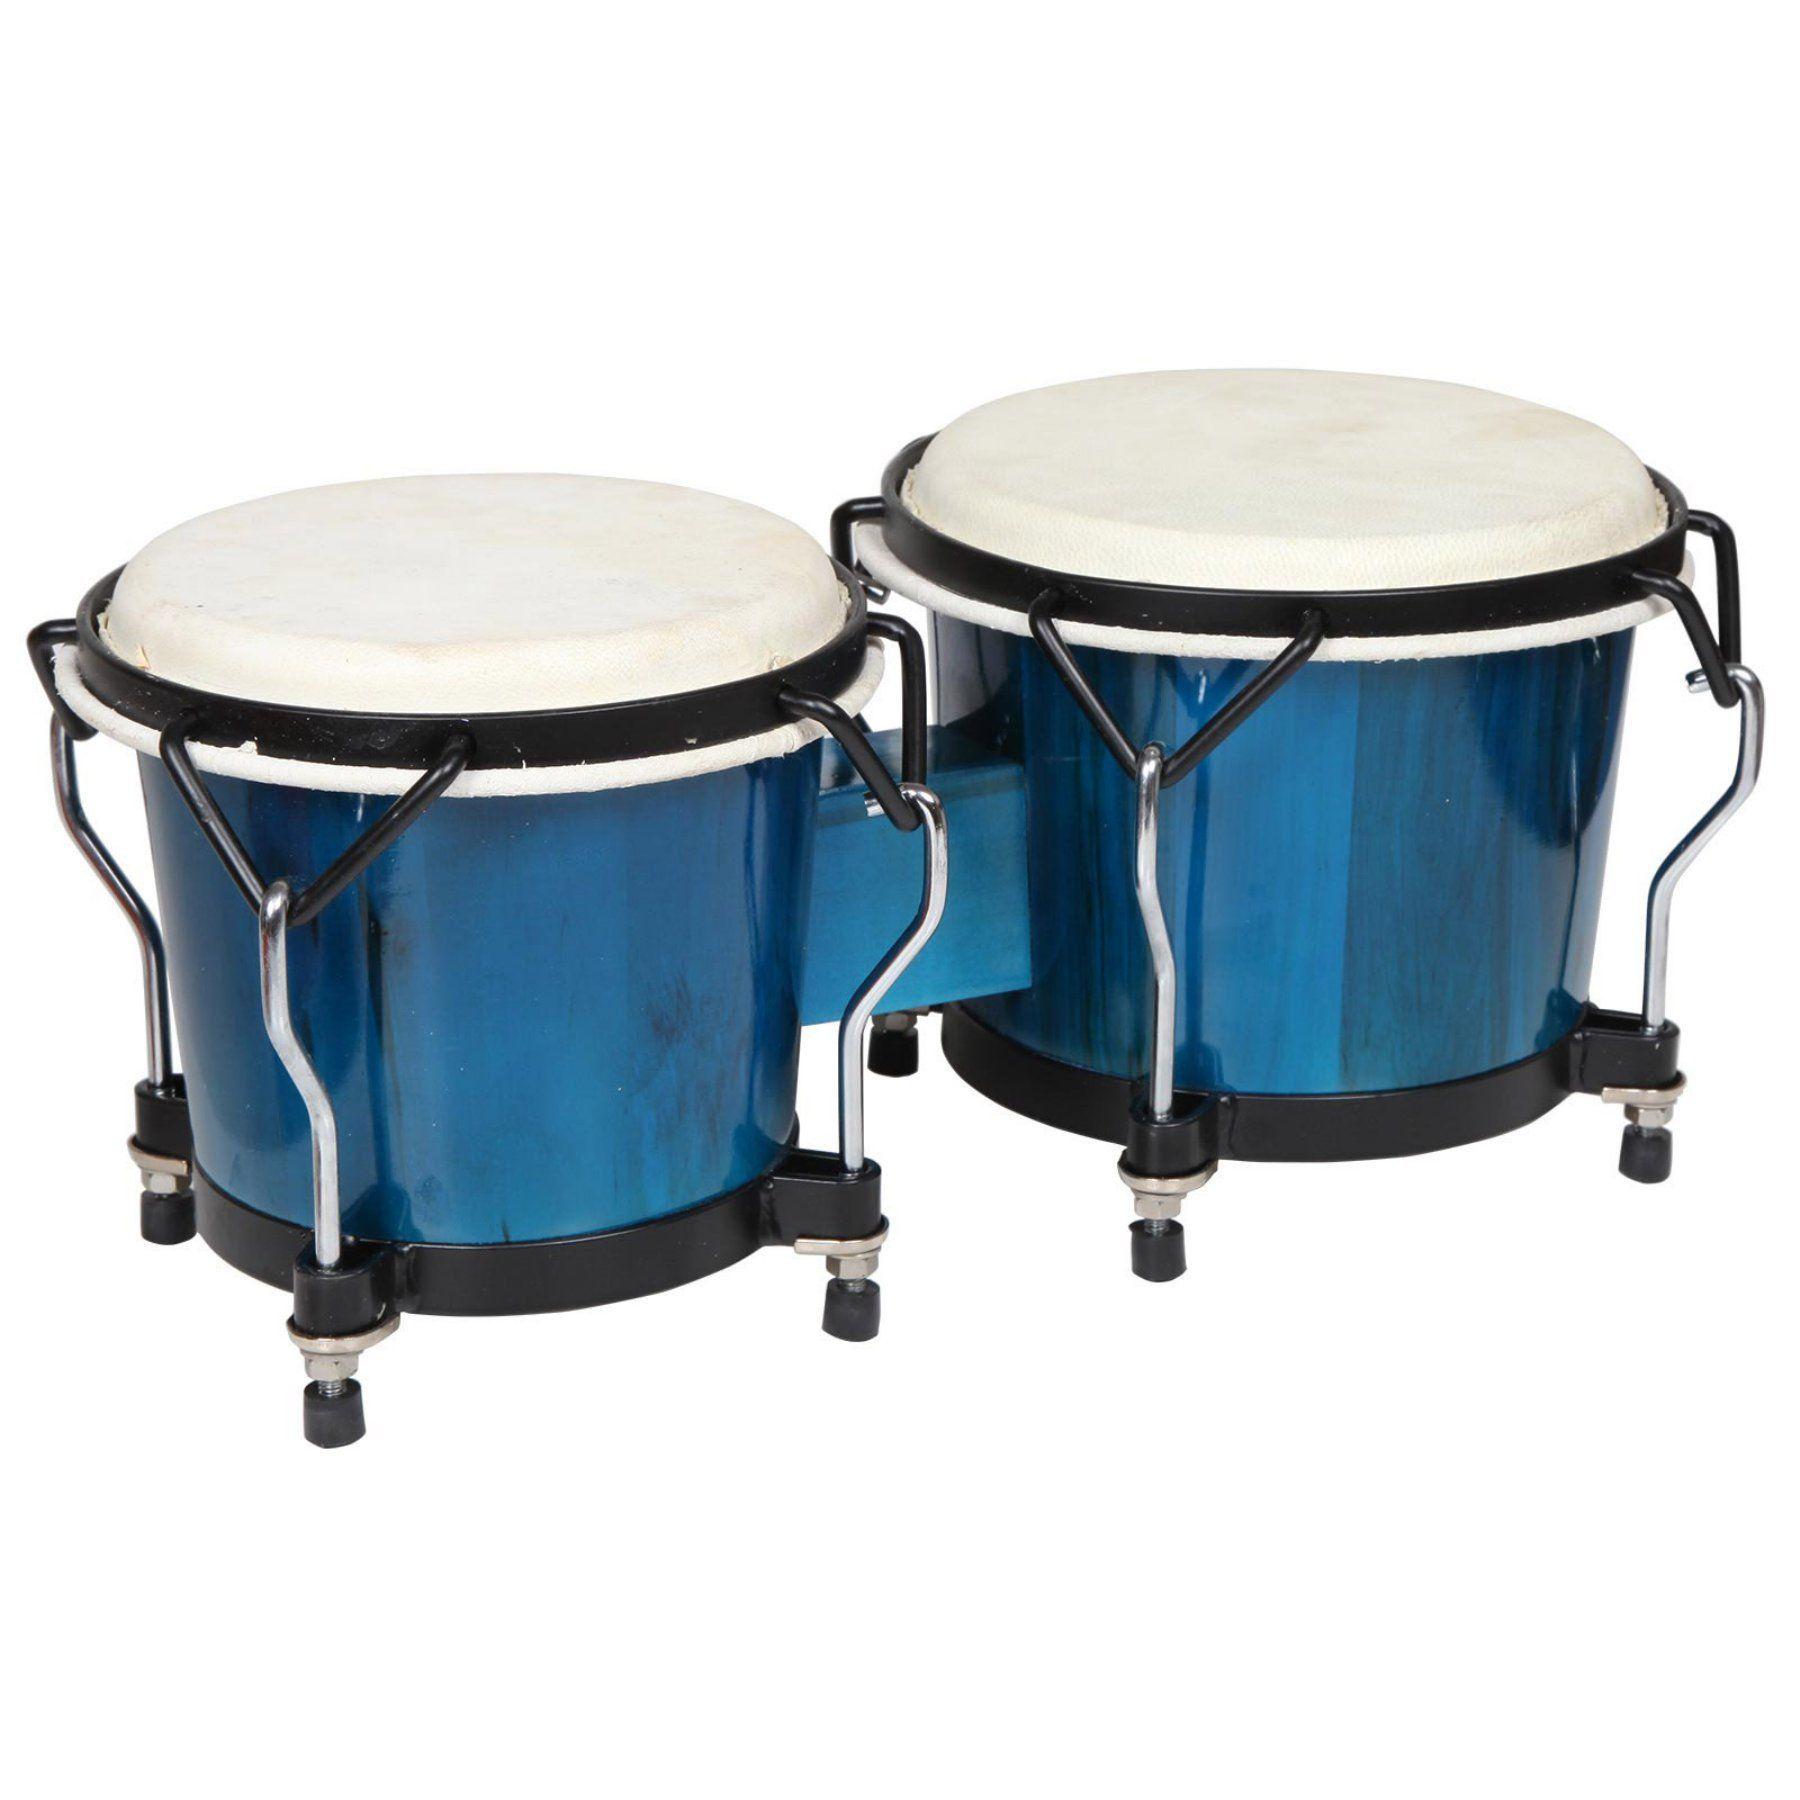 X8 Drums Endeavor Series Wood Bongos - X8-BNG-ENDV-OR